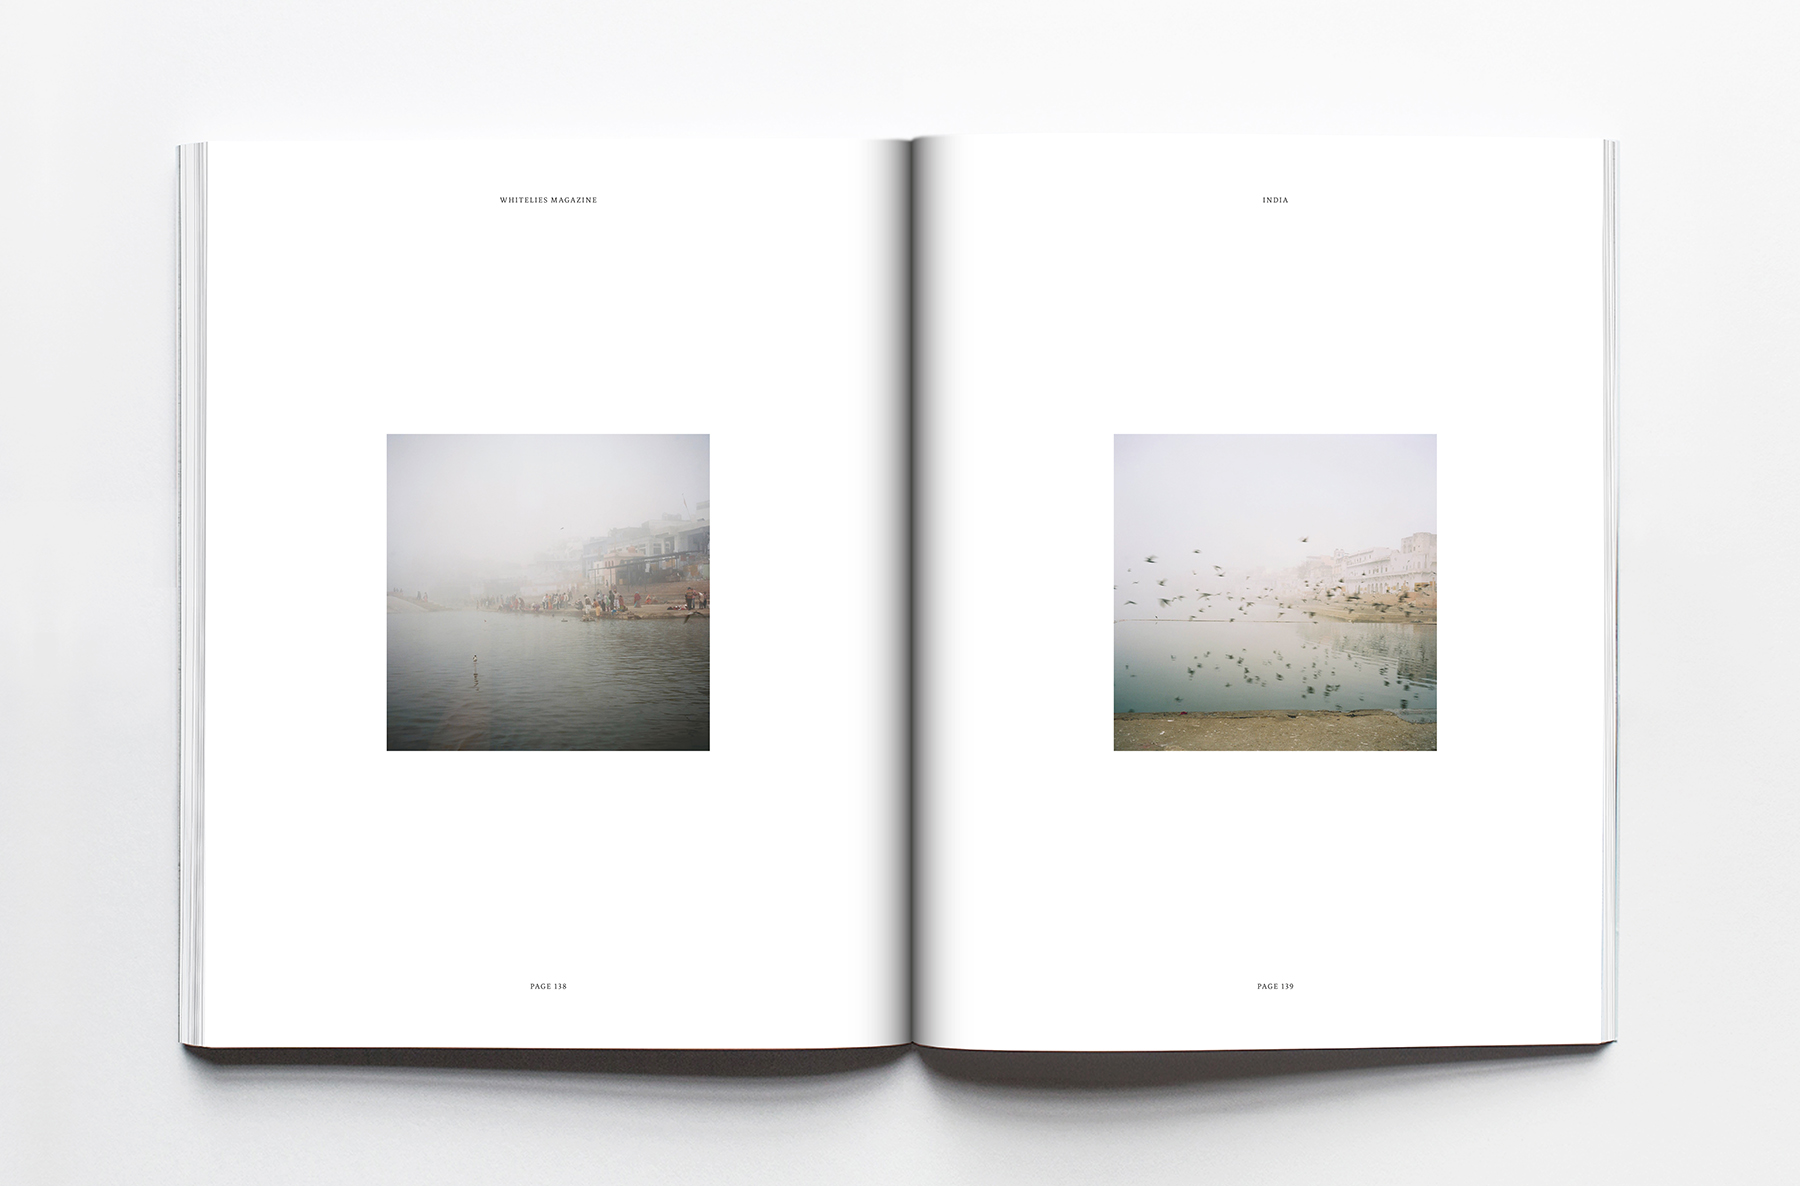 wla_magazine_37.jpg